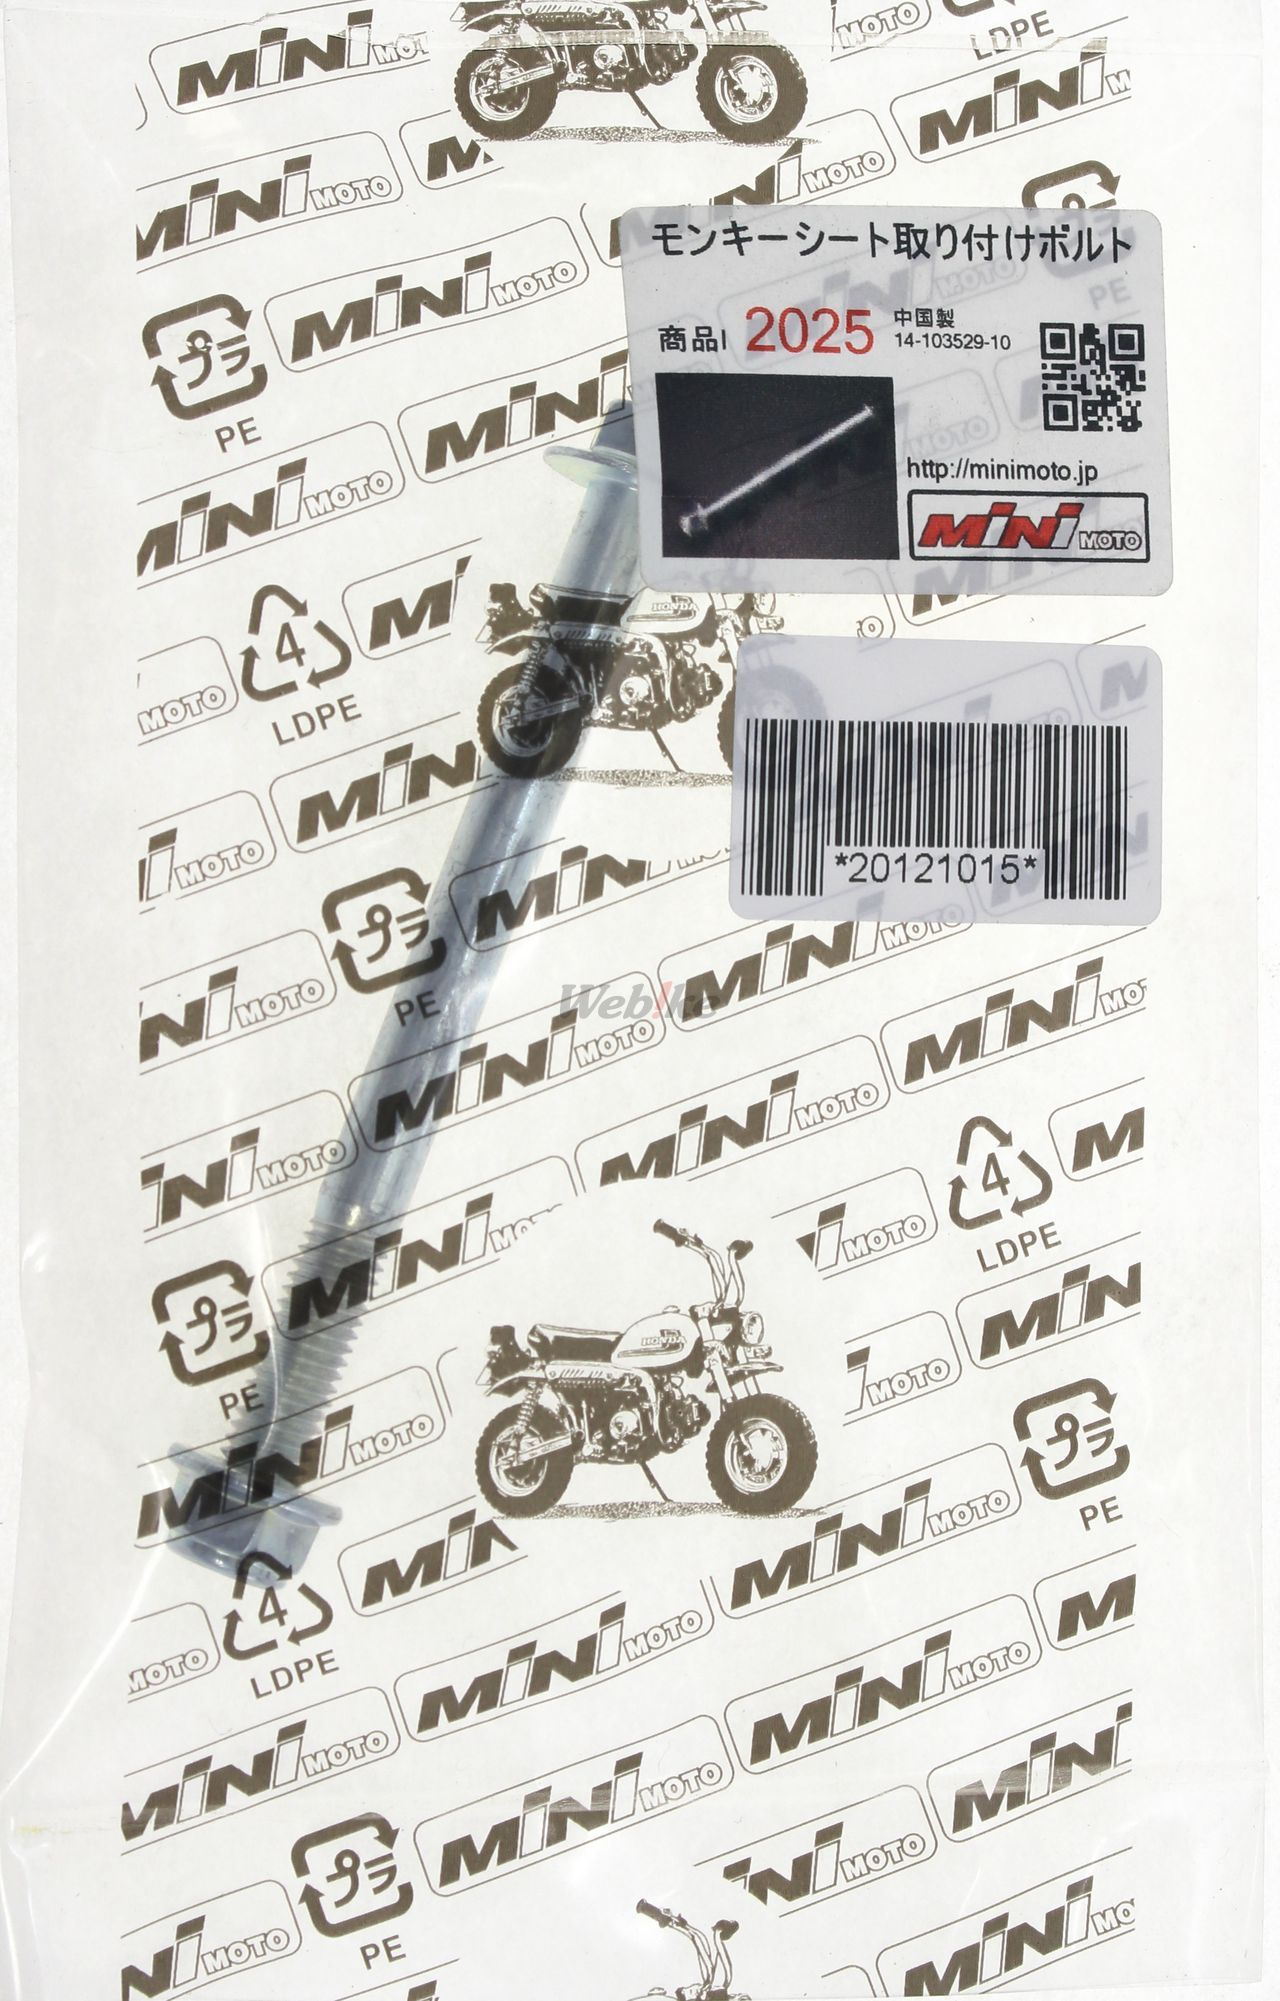 【MINIMOTO】Monkey坐墊安裝螺絲 - 「Webike-摩托百貨」